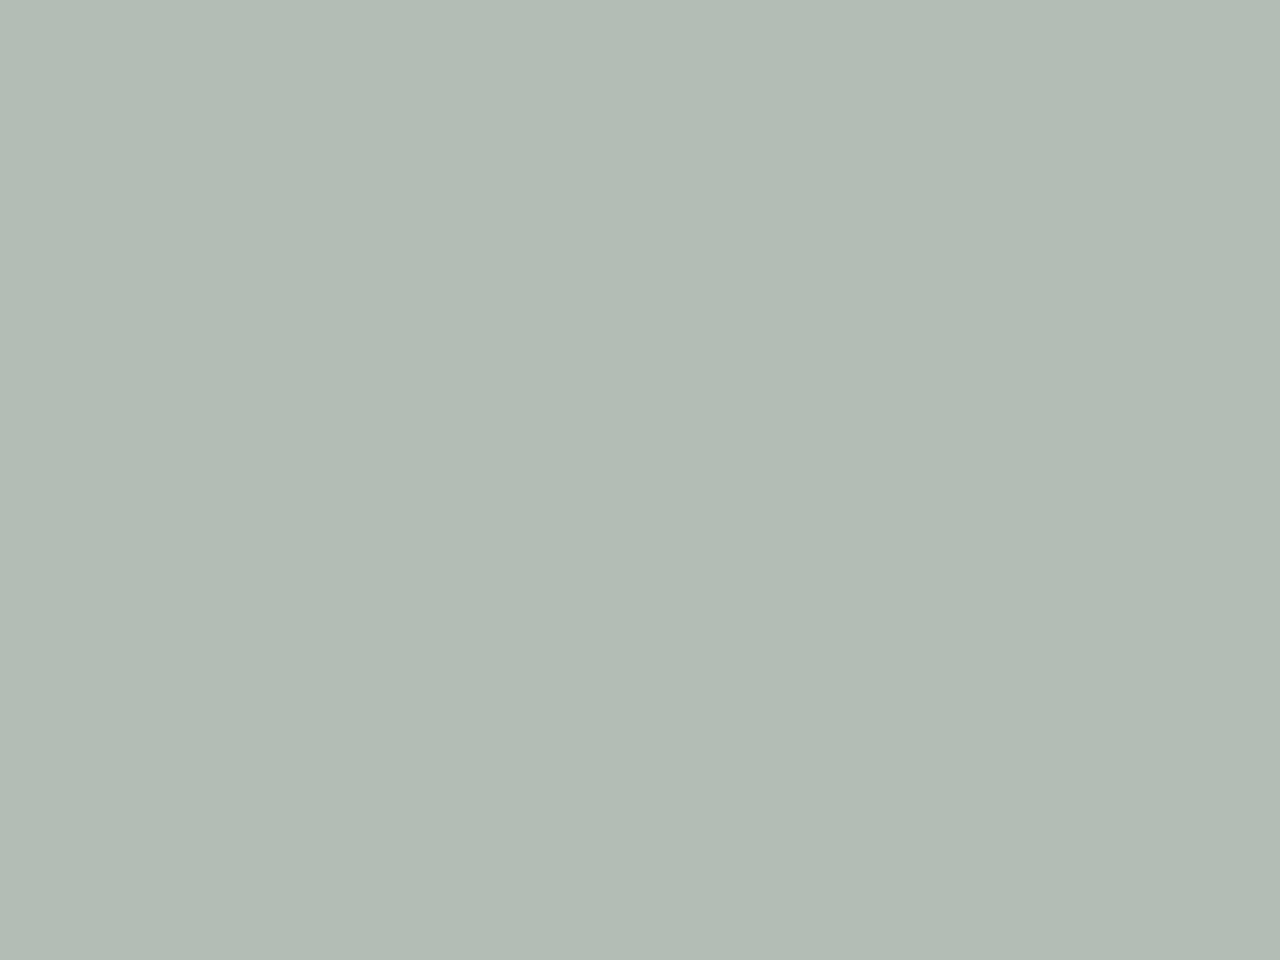 1280x960 Ash Grey Solid Color Background